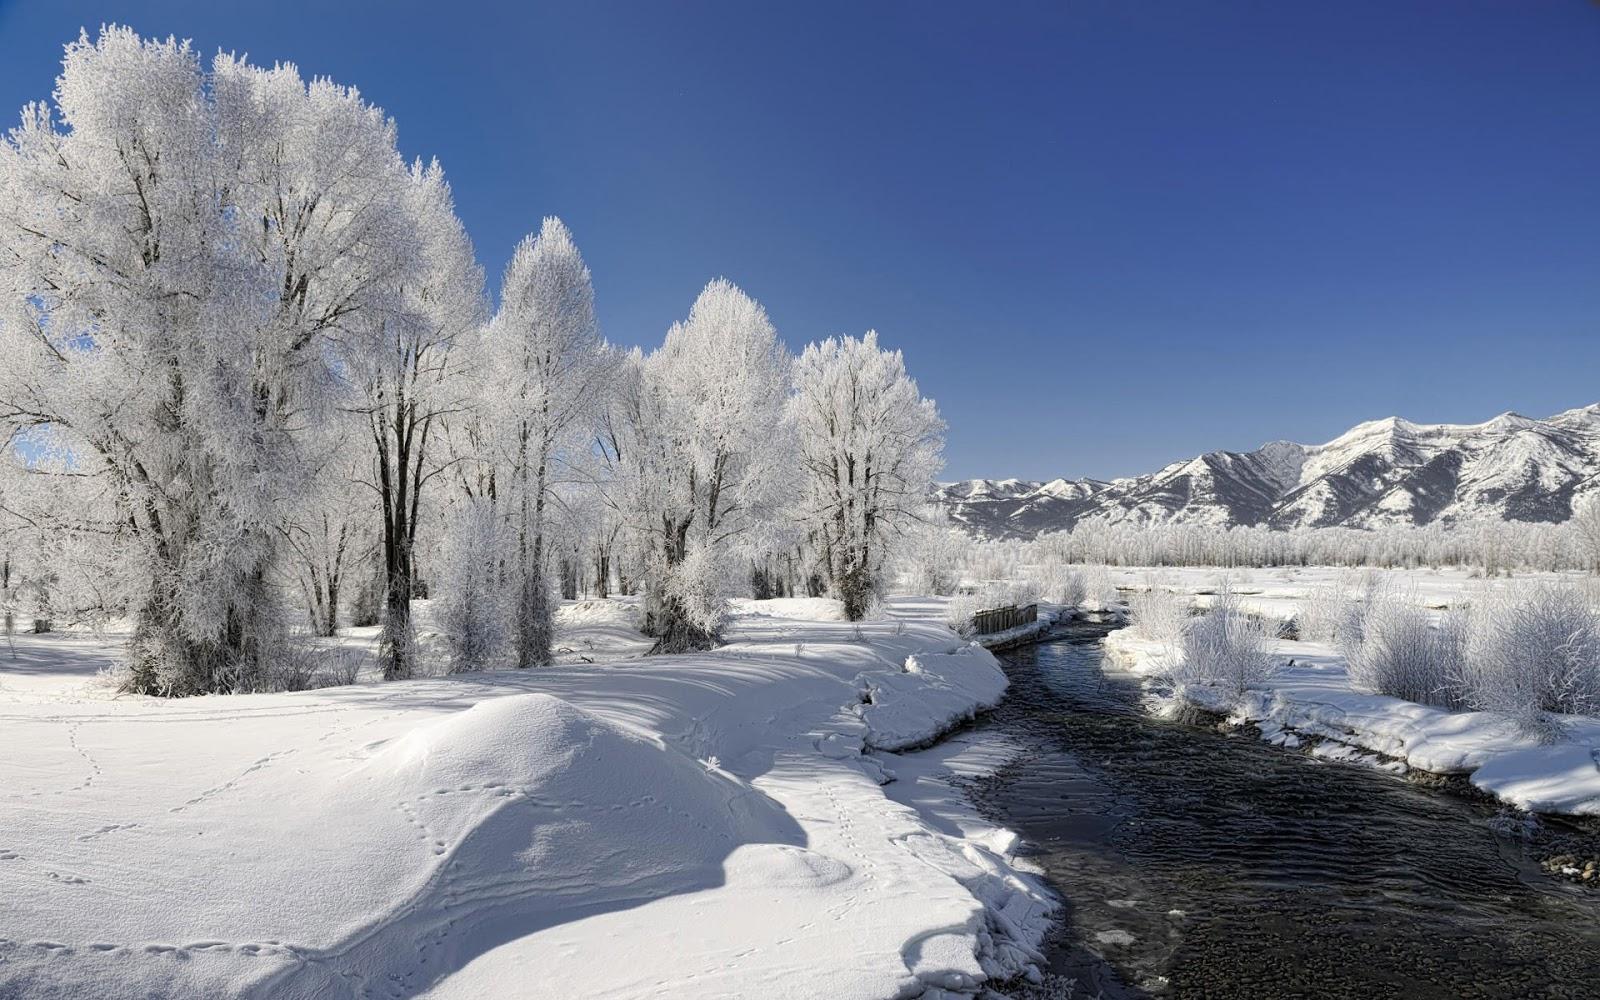 Wallpapers Beauty of Winter season Nature beautiful HD Desktop 1600x1000